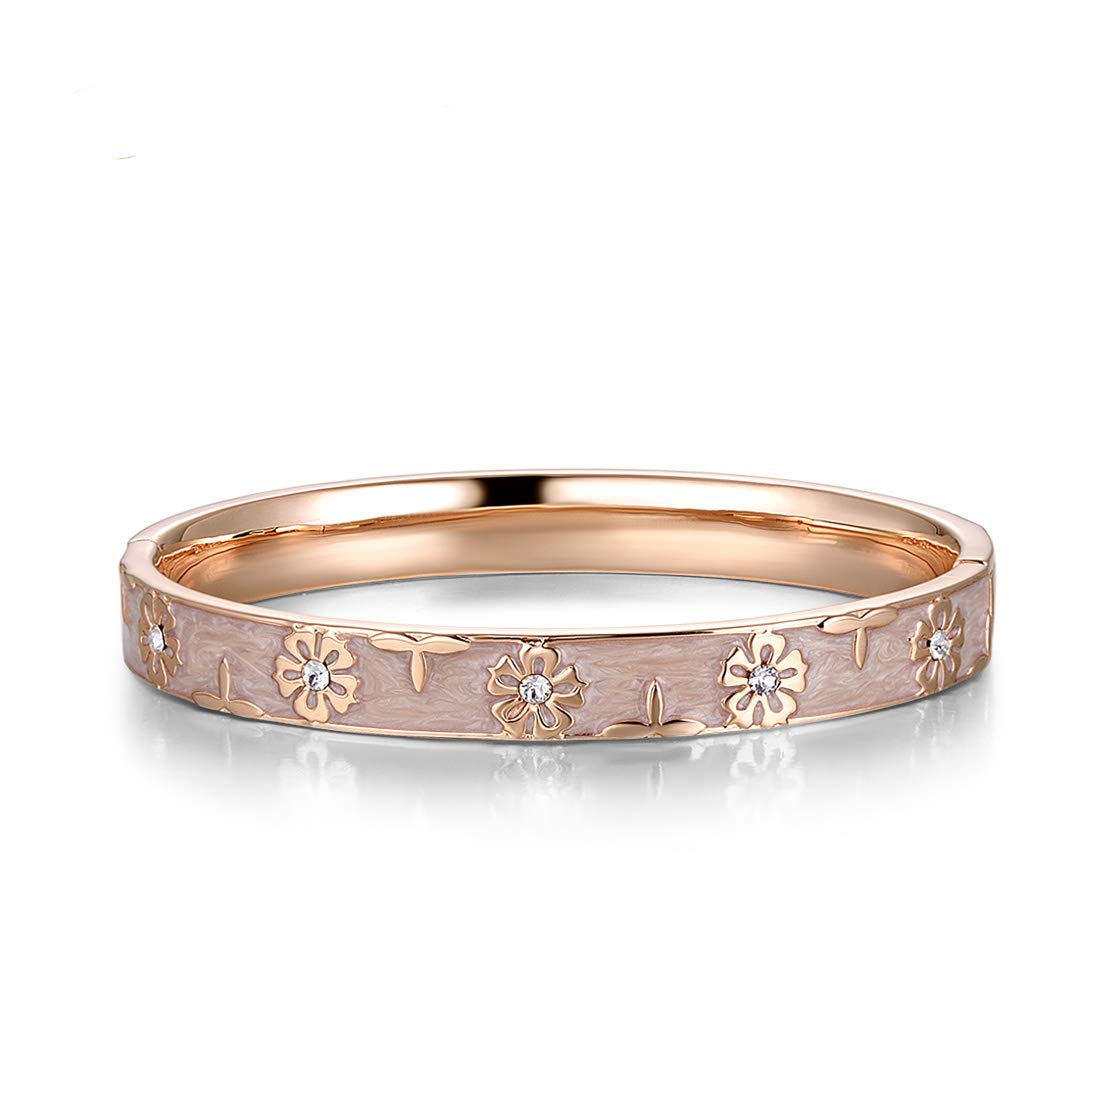 Santuzza Rose Gold Plating Bangle Brass Enamel Flower Pattern Bracelet with Crystal Ideal Jewelry Gift for Women Girls (Pink)